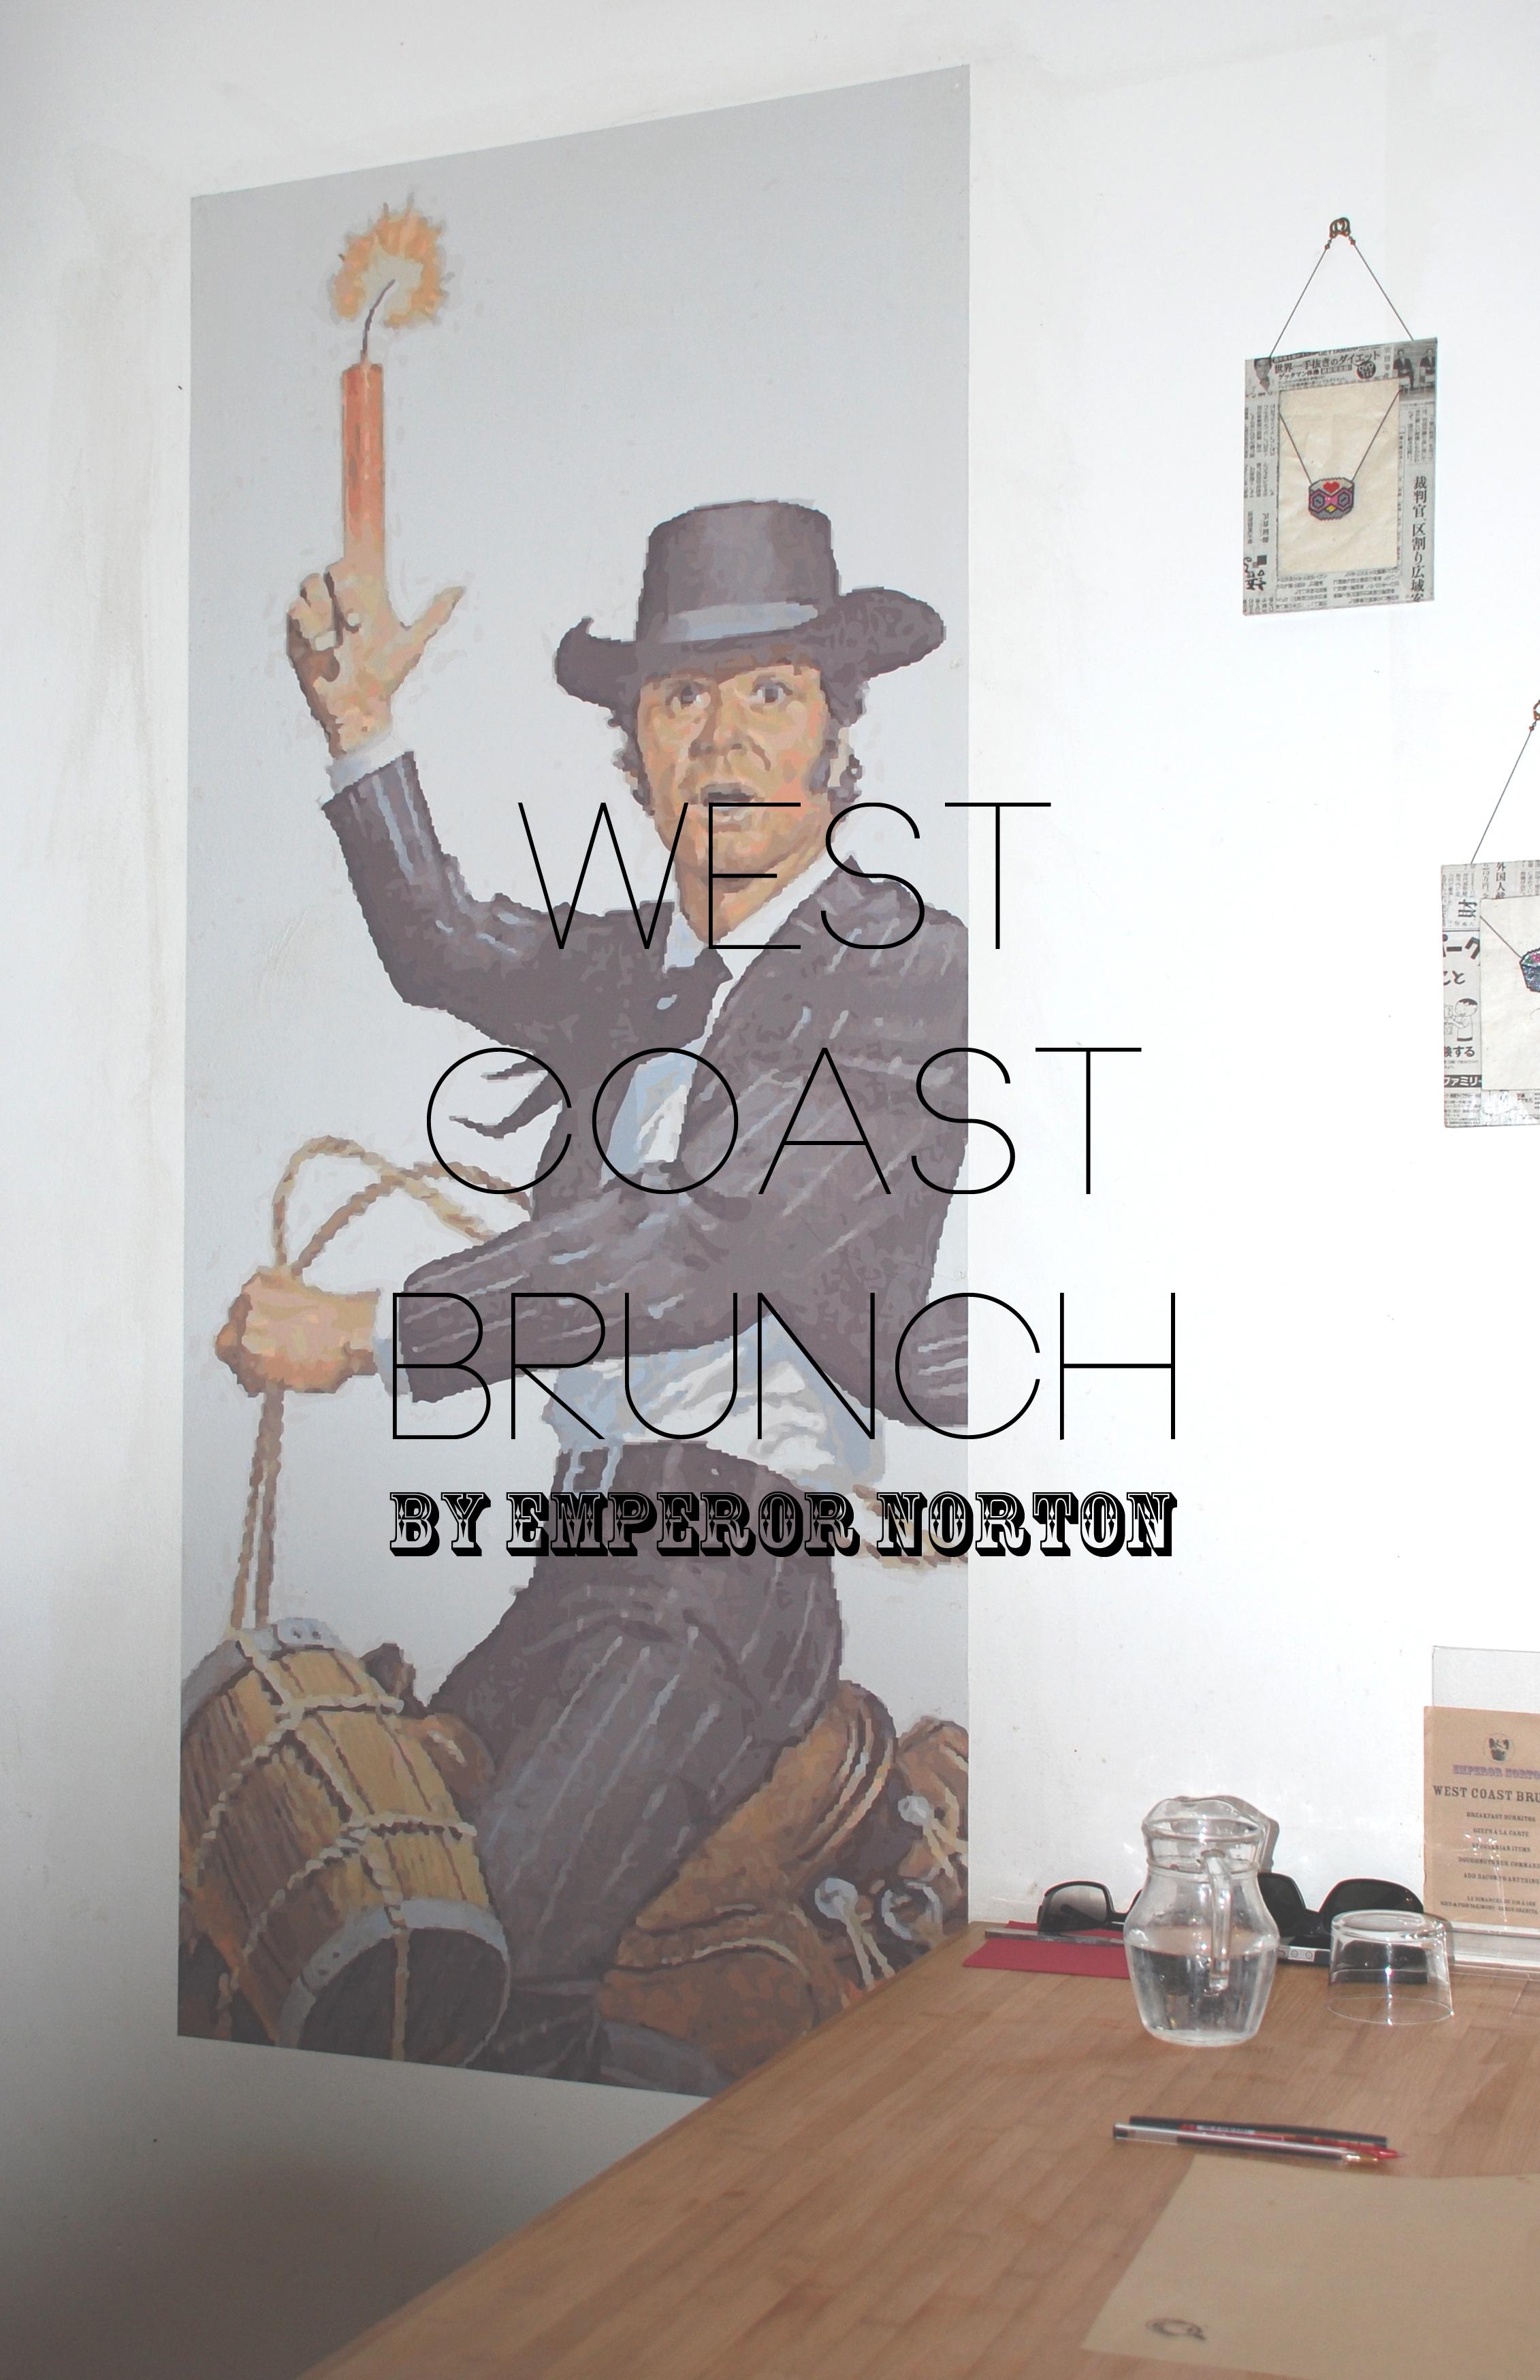 emperor-norton-brunch-paris-dimanche-rice-and-fish-yakimono-by-le-polyedre_visuel